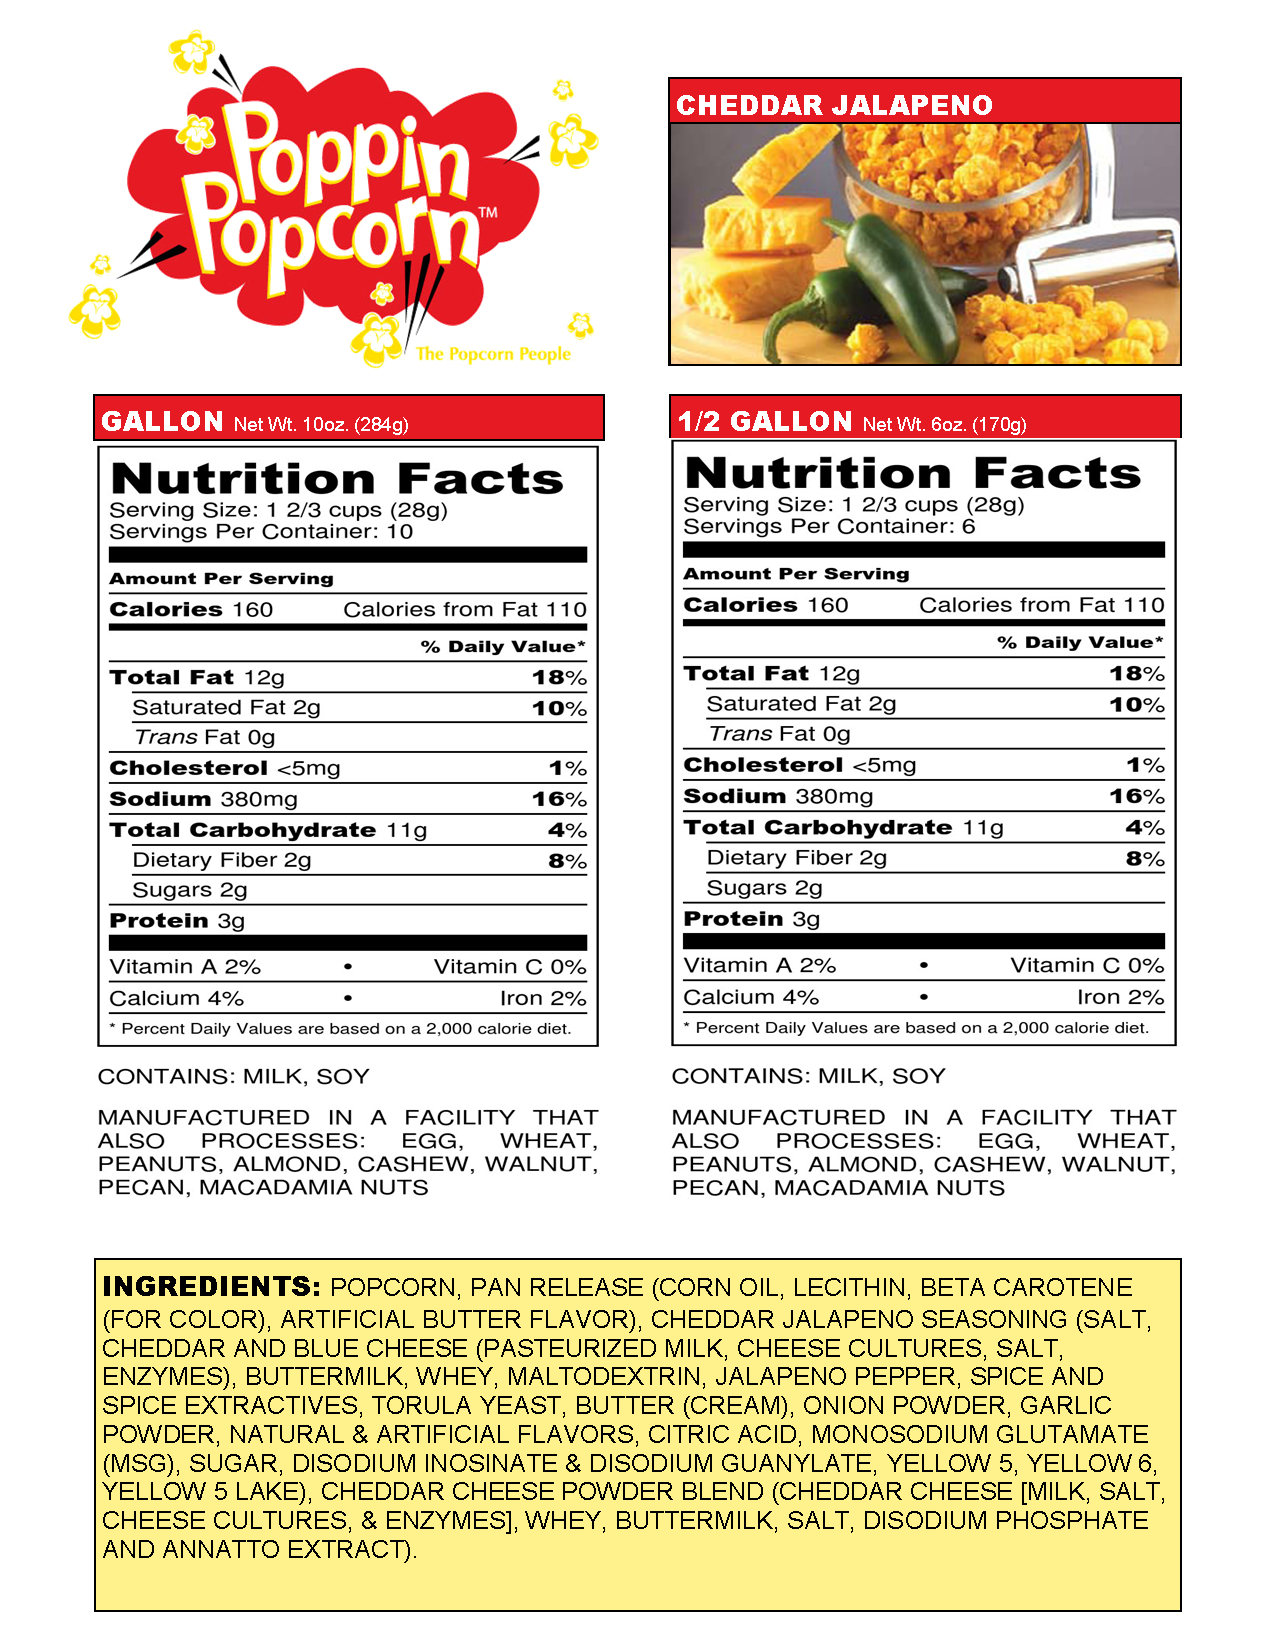 Cheddar Jalapeno Web Nutritional